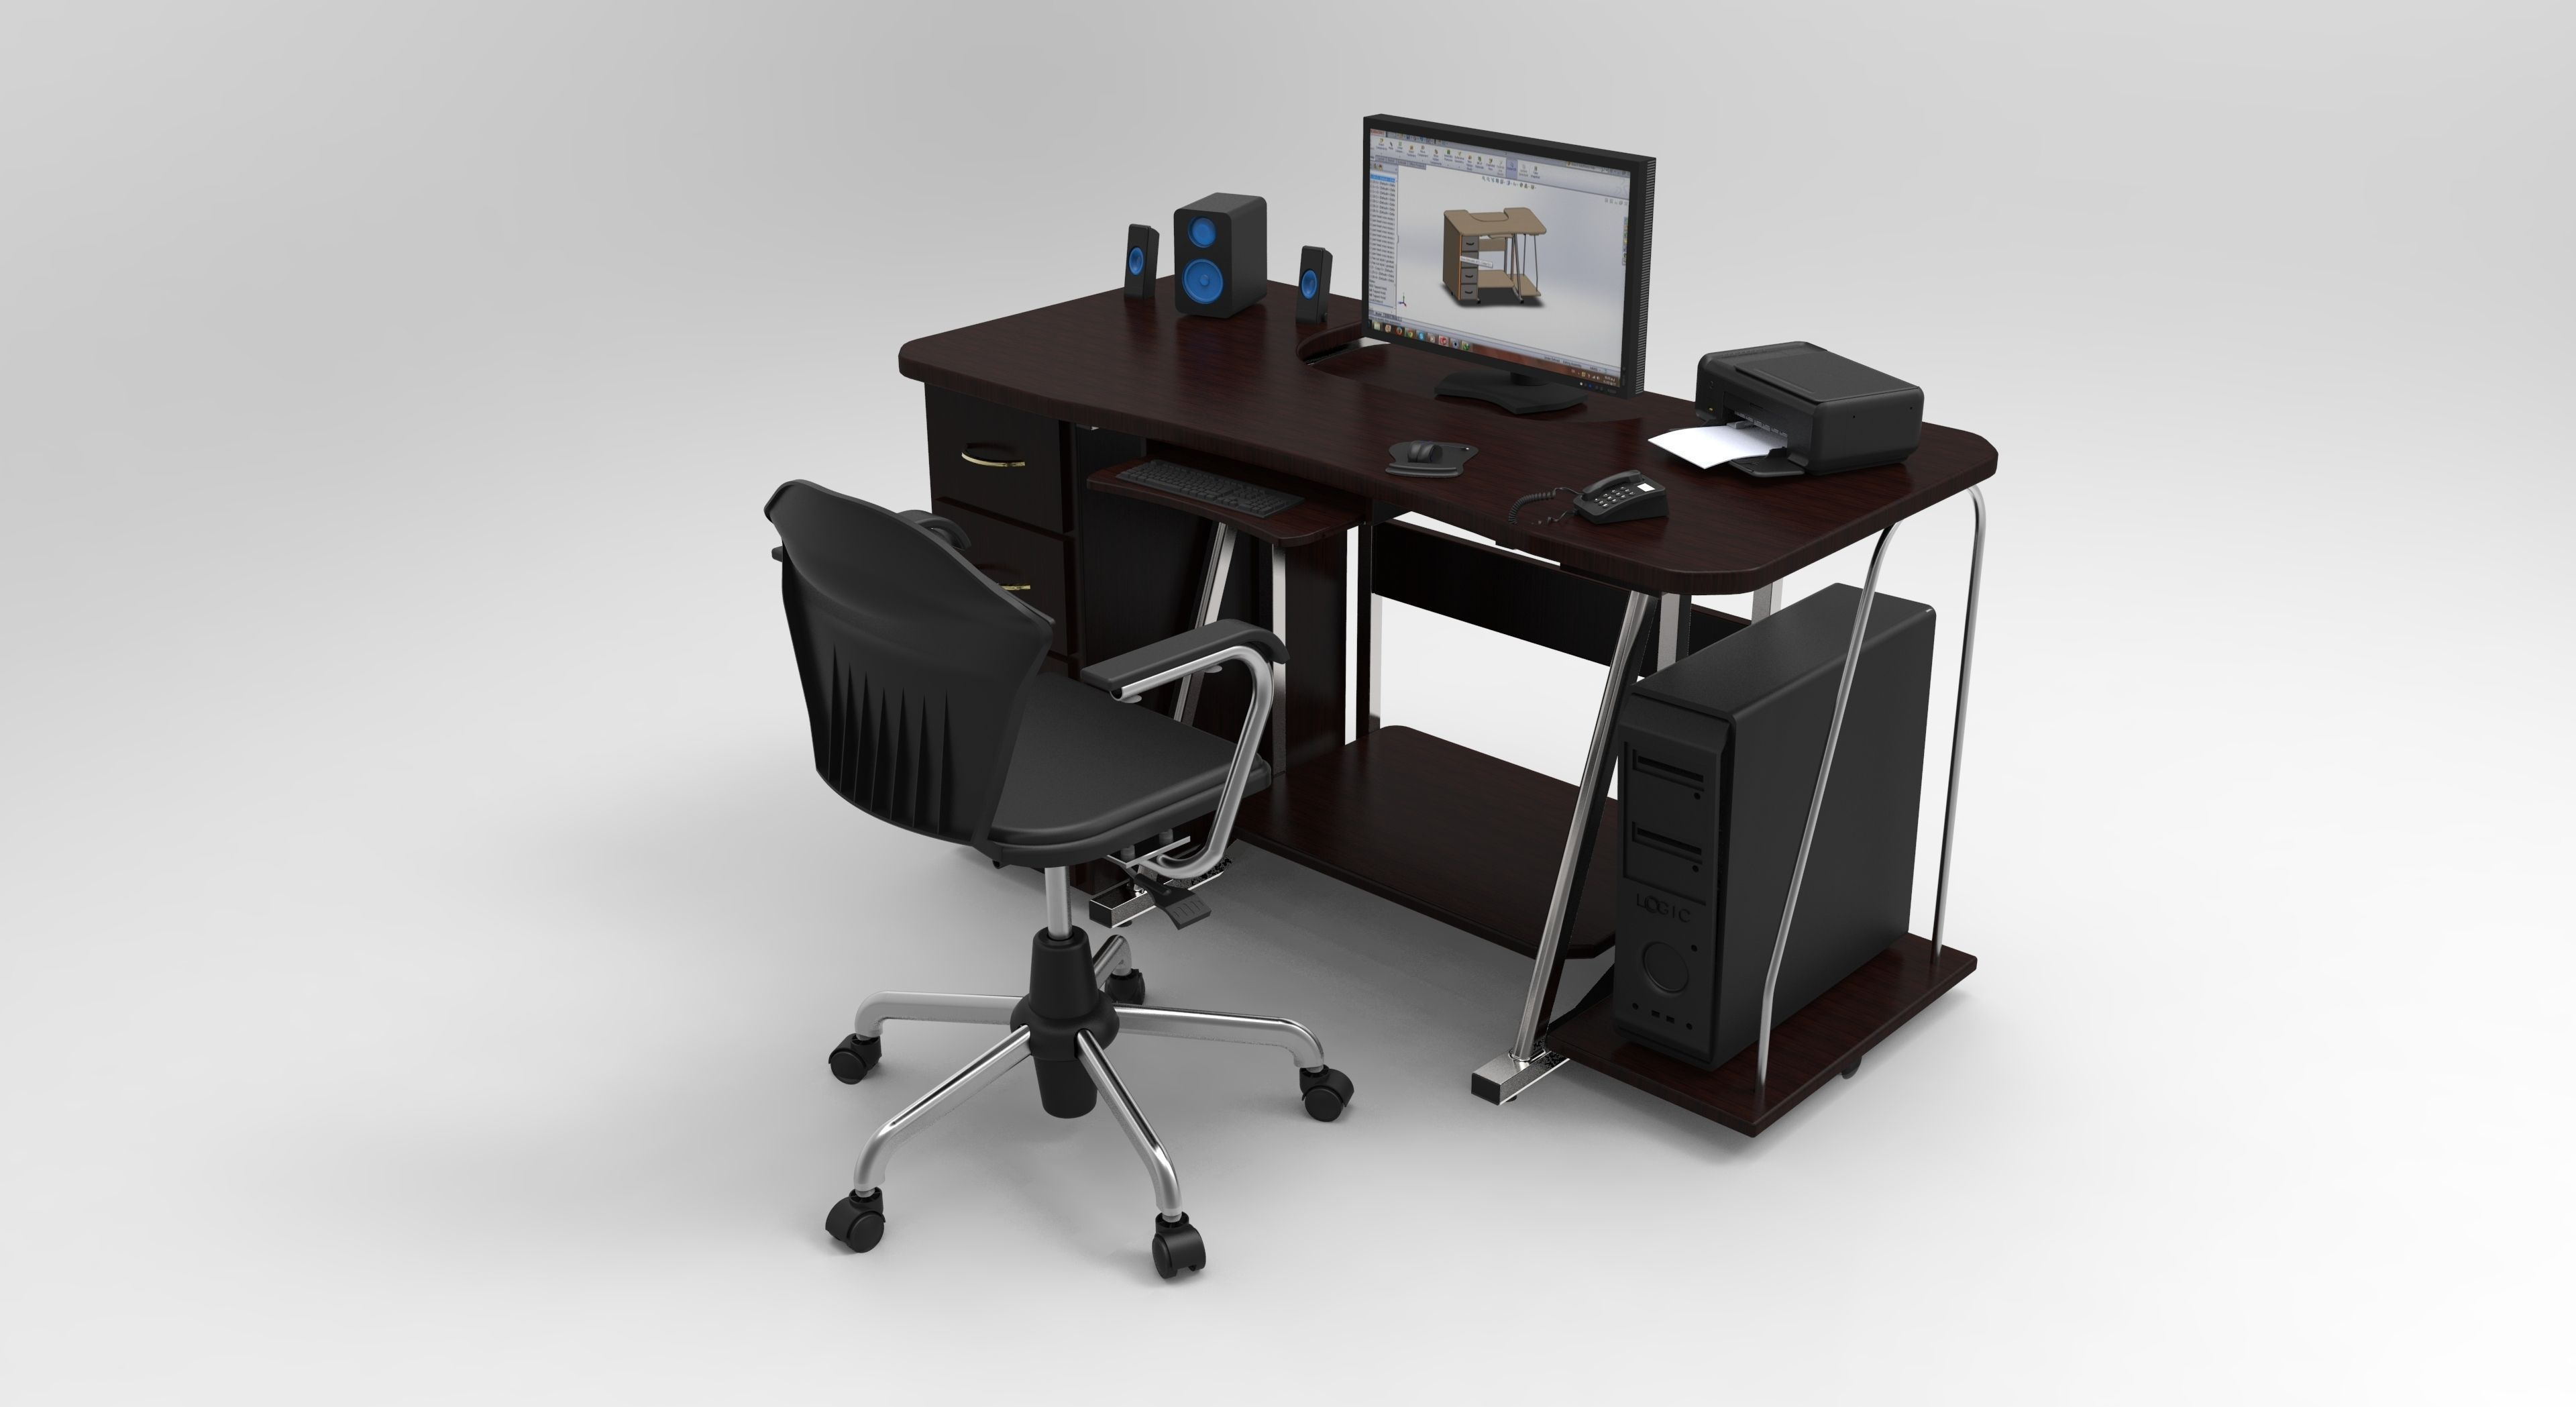 pc table 3 3D model SLDPRT SLDASM SLDDRW IGE IGS IGES